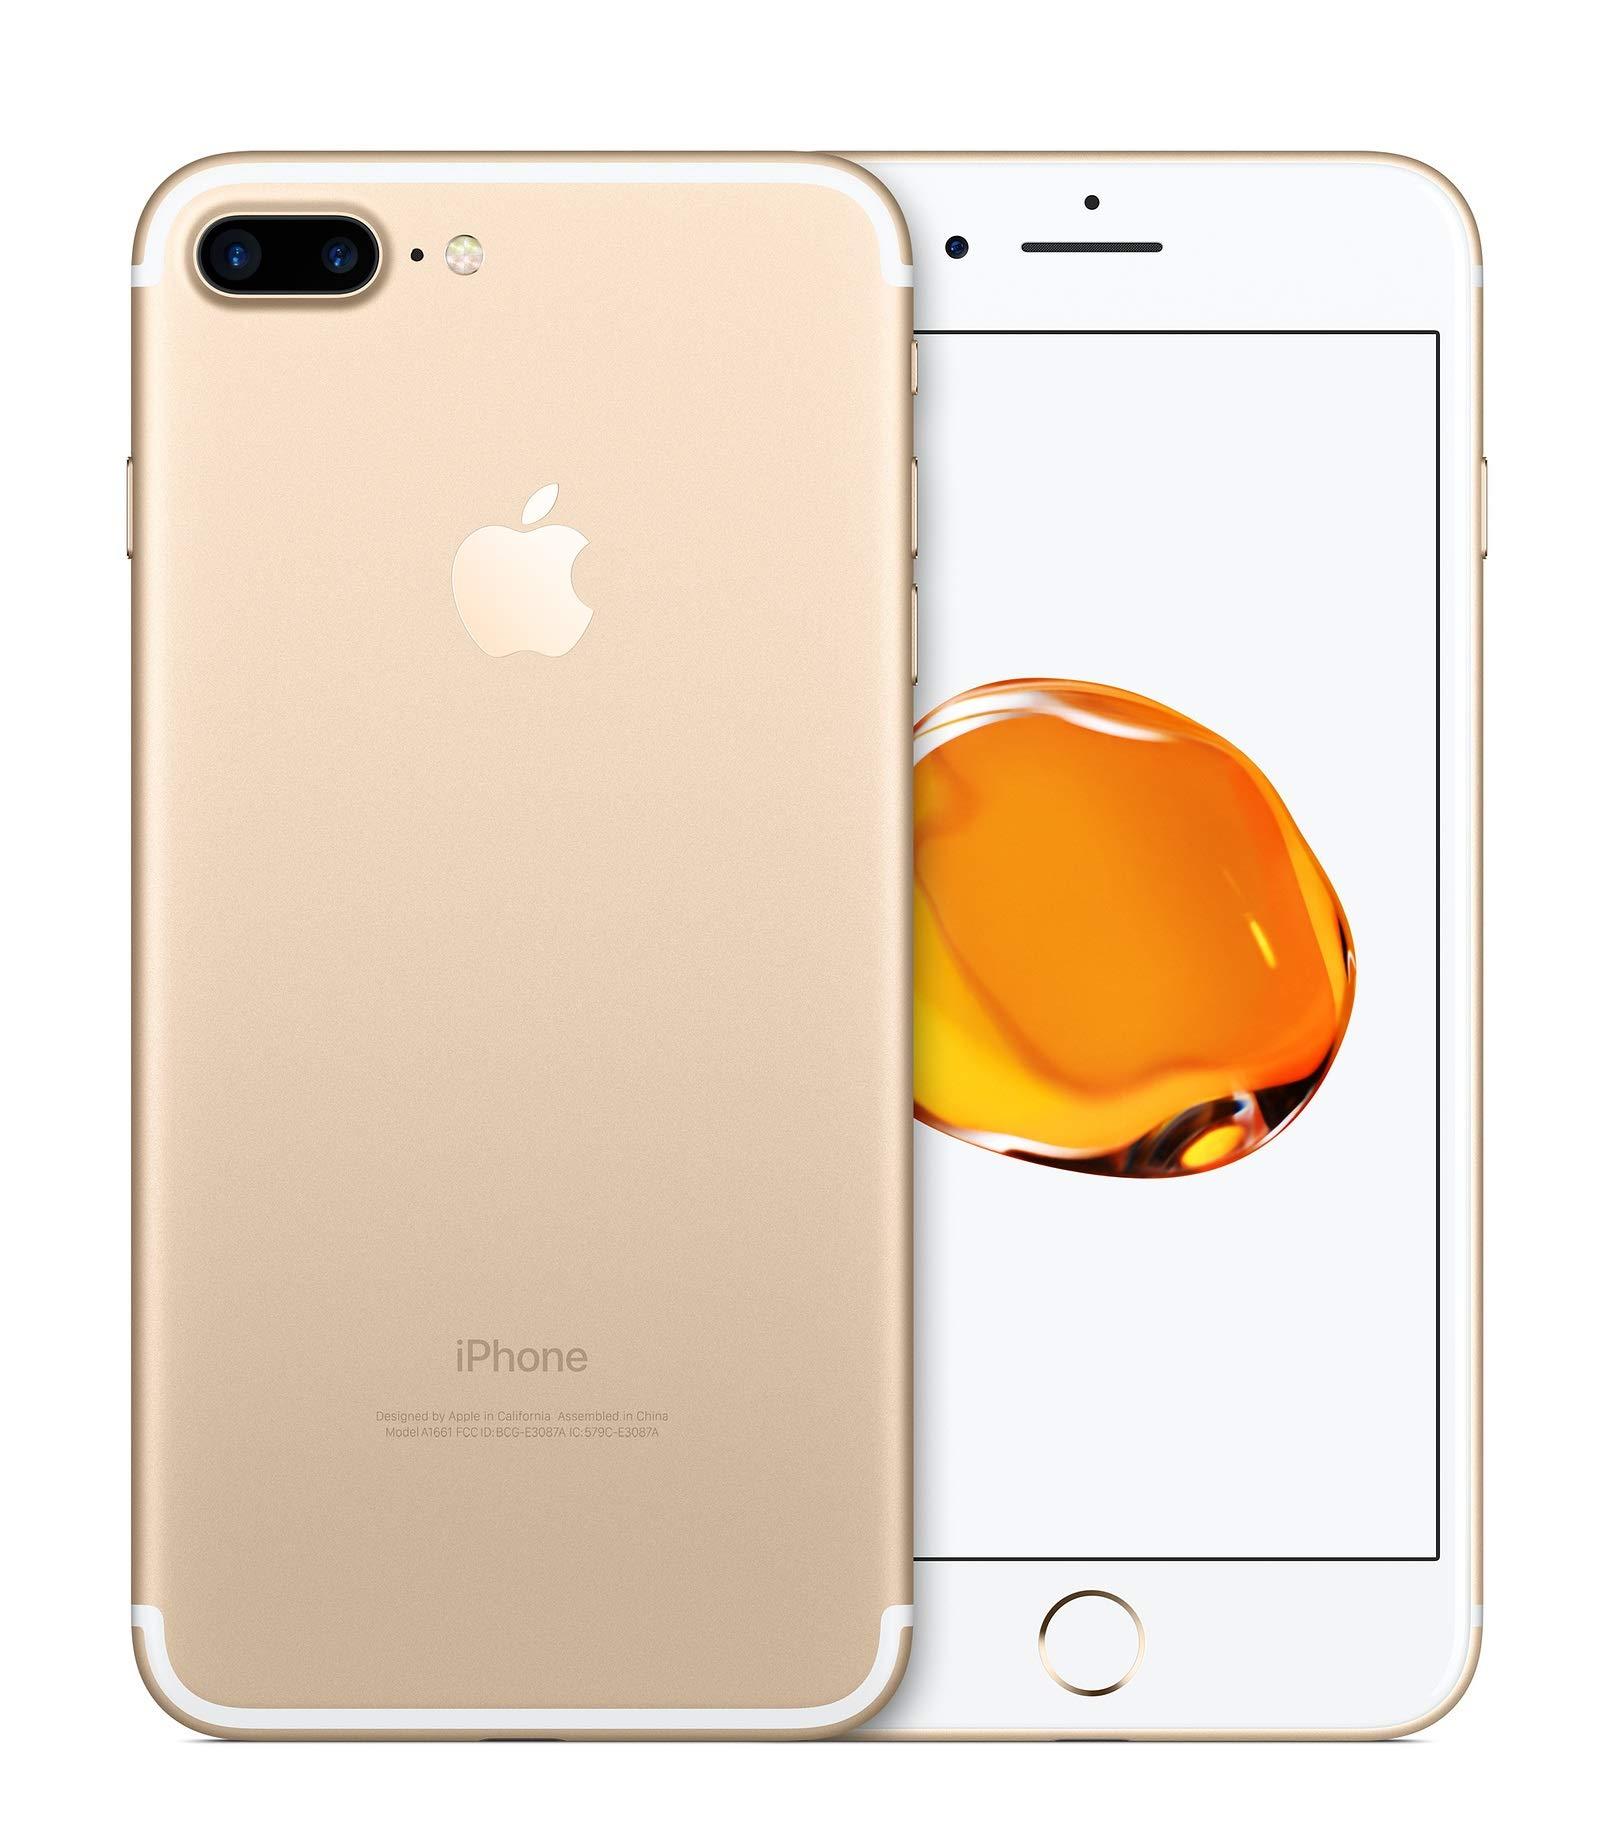 Apple iPhone 7 Plus, 128GB, Gold - Fully Unlocked (Renewed)